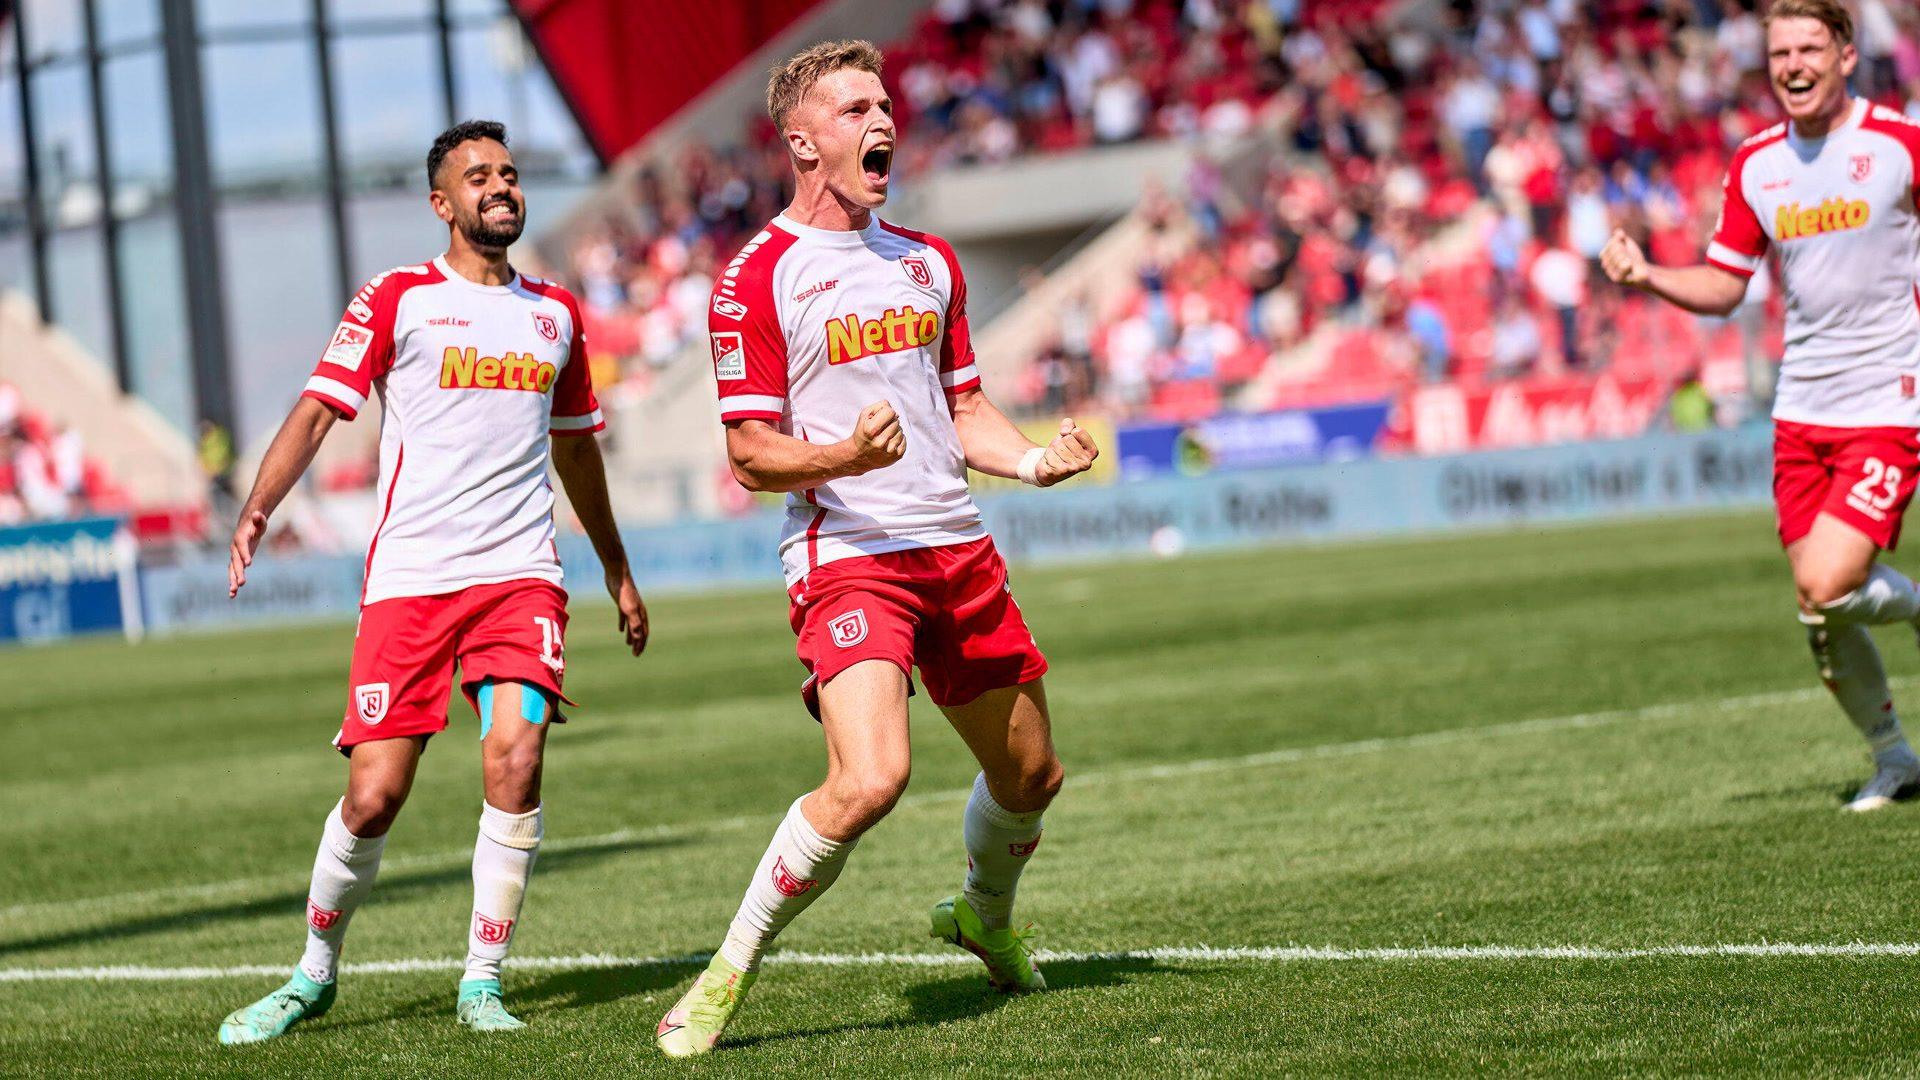 Bundesliga 2, Matchday 4 round-up: Regensburg stay perfect with convincing Schalke win